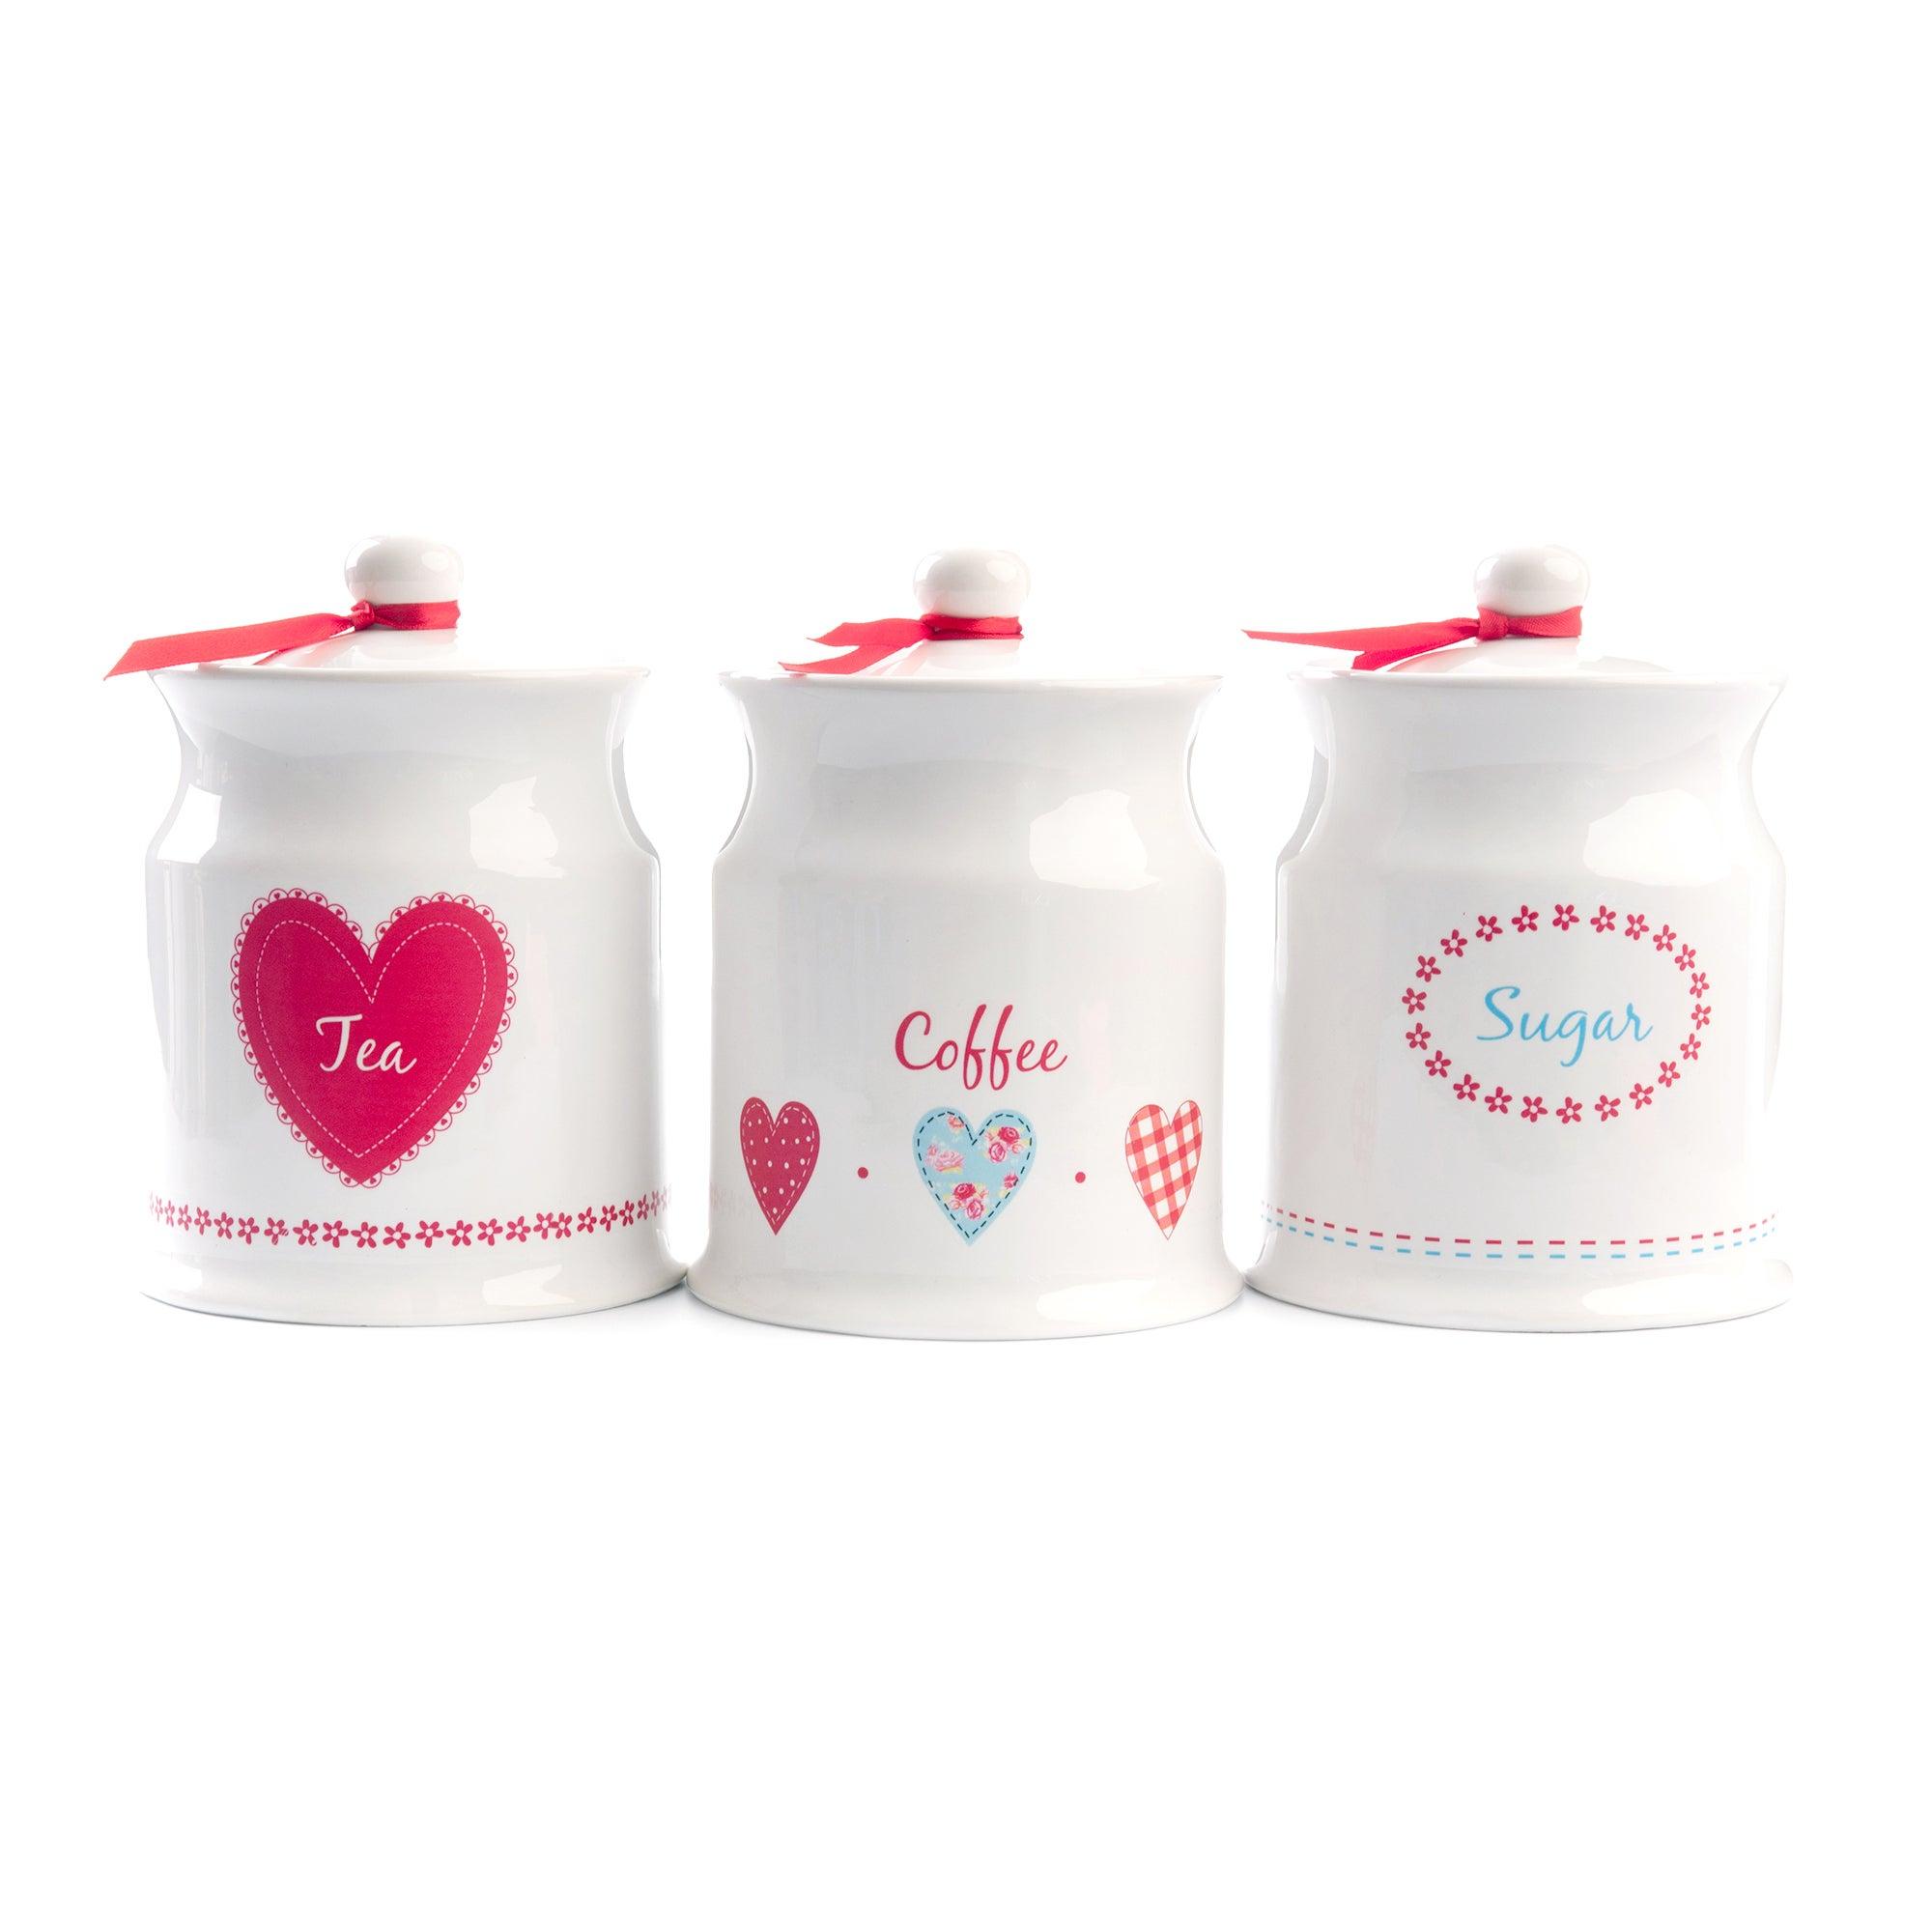 Ditsy Set of 3 Tea Coffee and Sugar Jars